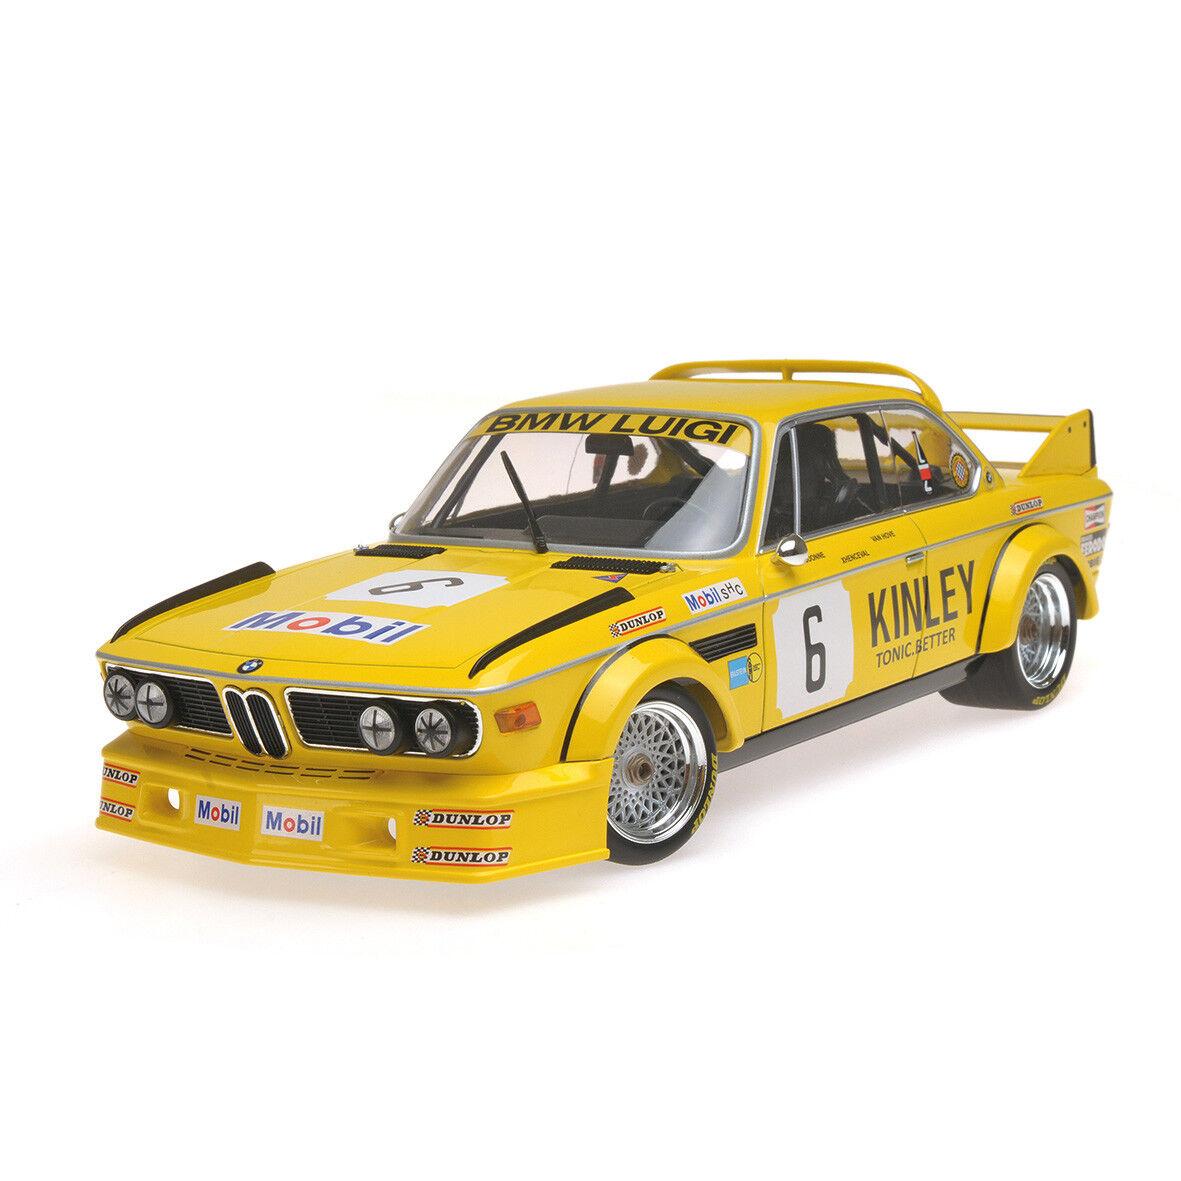 BMW 3.0 CSL  6 LUIGI WINNER CAR 1979 1/18 DIECAST MODEL BY MINICHAMPS 155792506